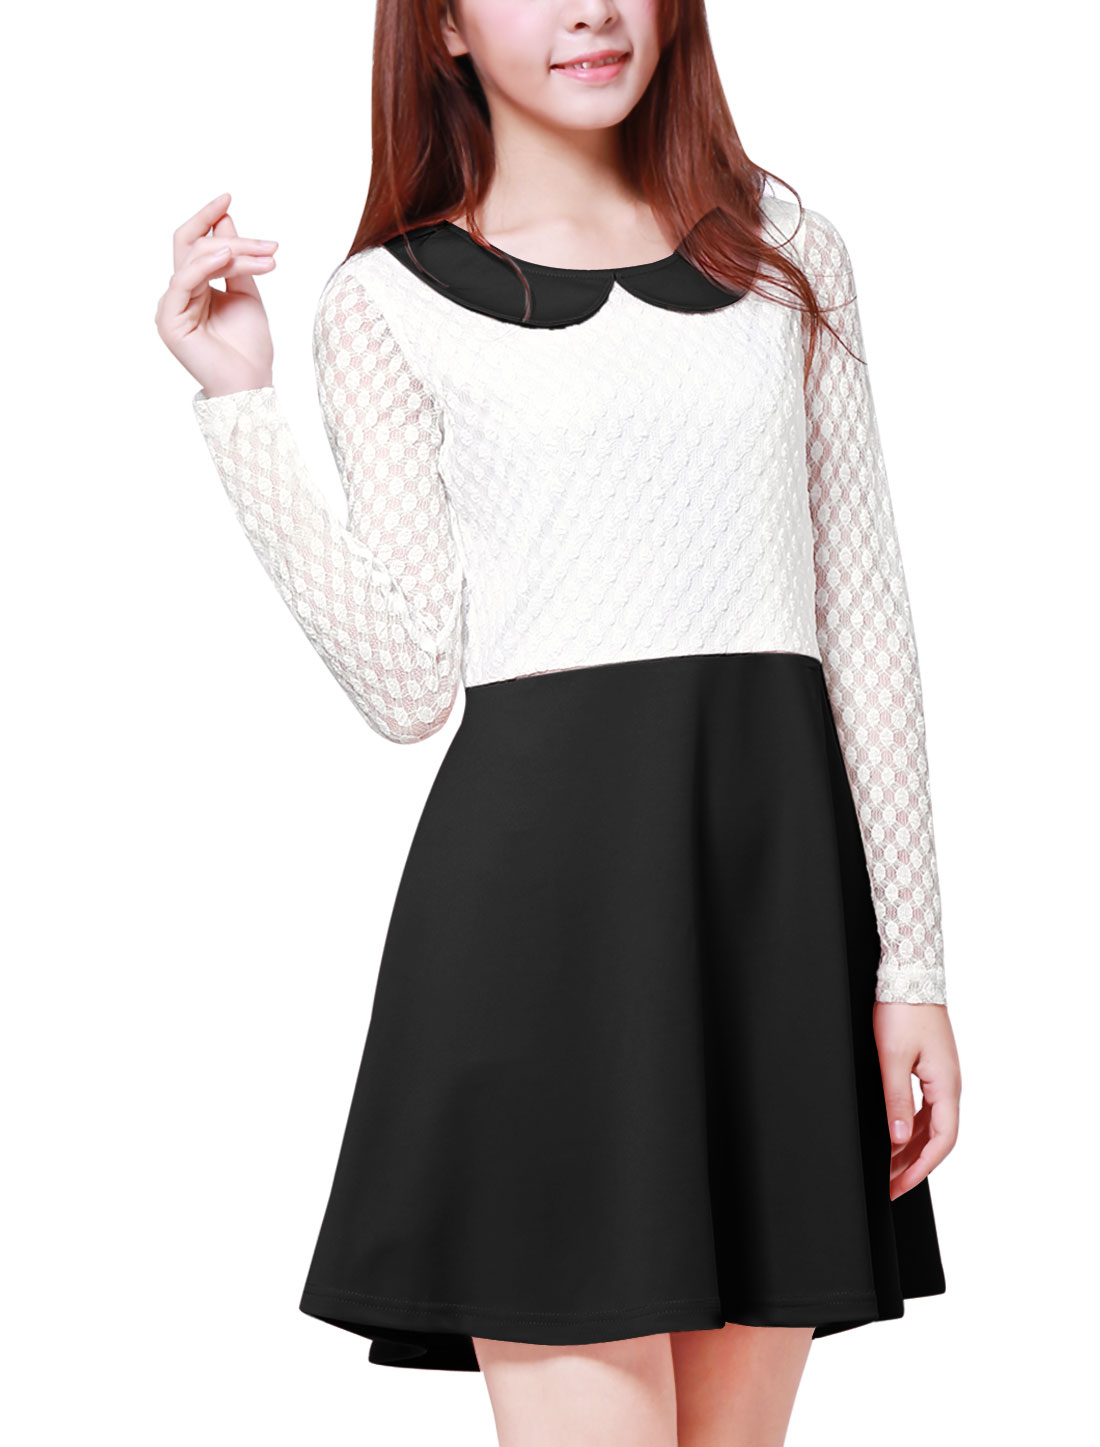 Women Doll Collar Mesh Panel Semi Sheer Above Knee Dress Black S